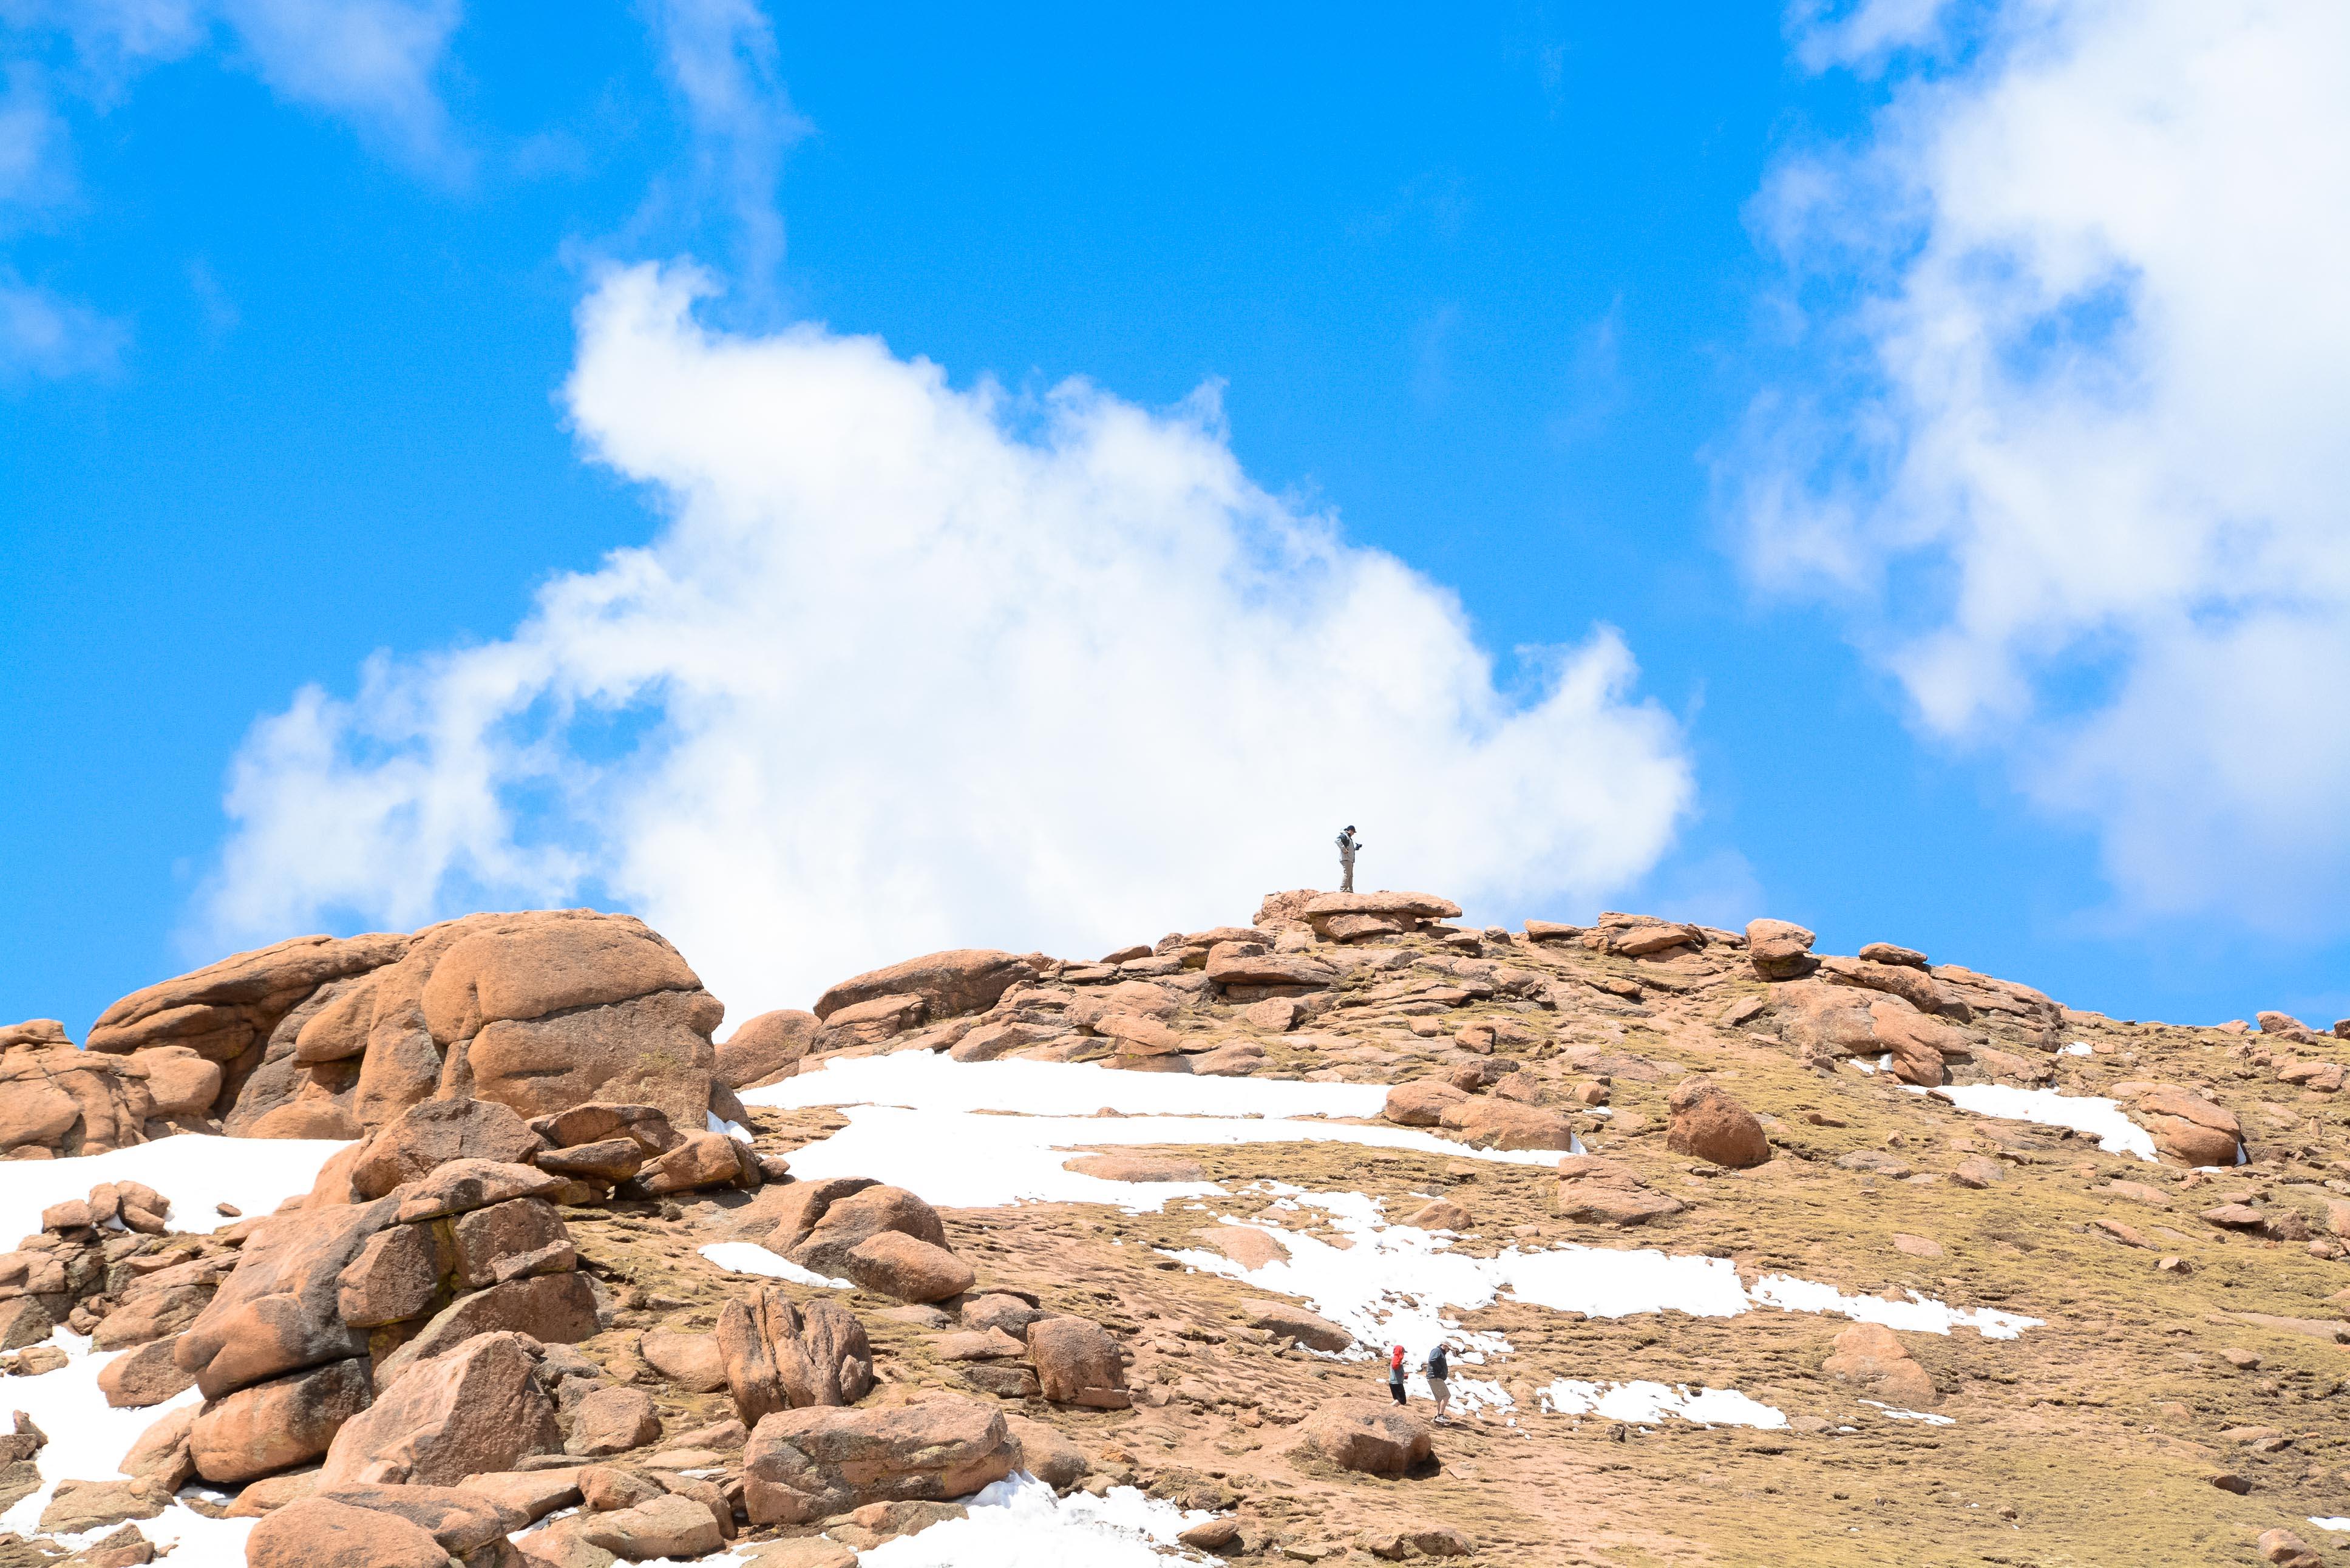 Colorado, Pikes Peak, Pikes Peak International Hill Race, America's Mountain, Colorado Springs, Denver, Boarding Competed, Reiseblog